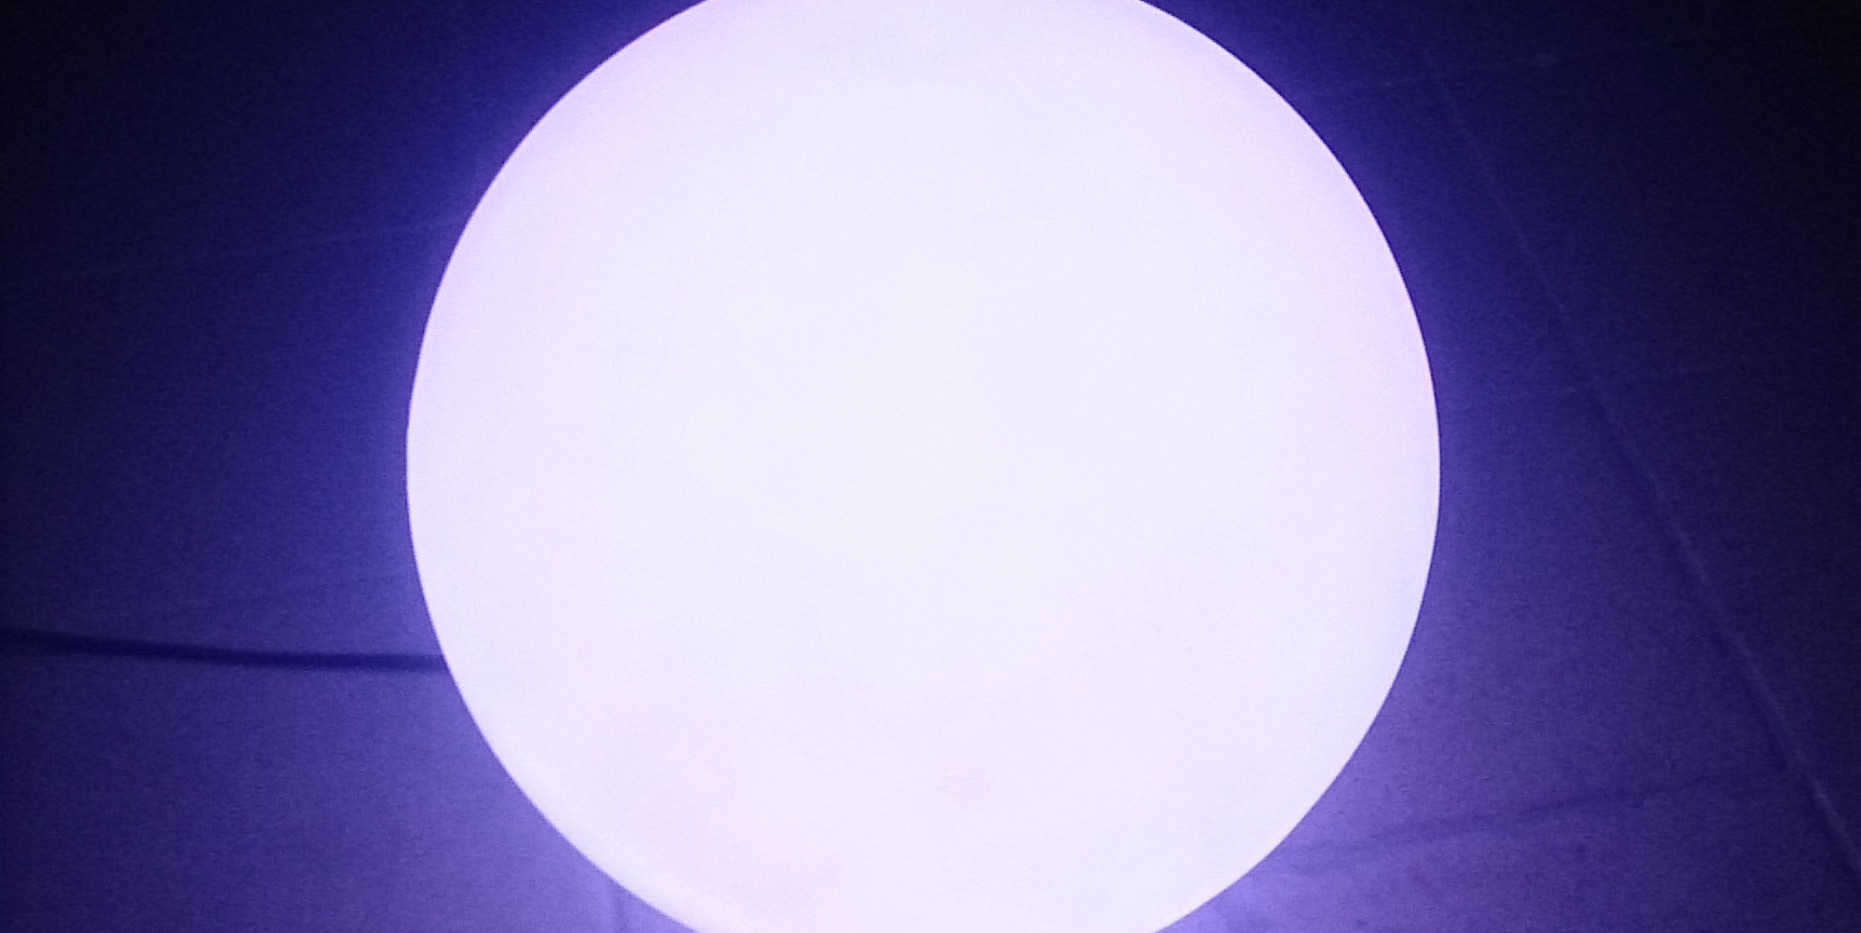 Светильник шар